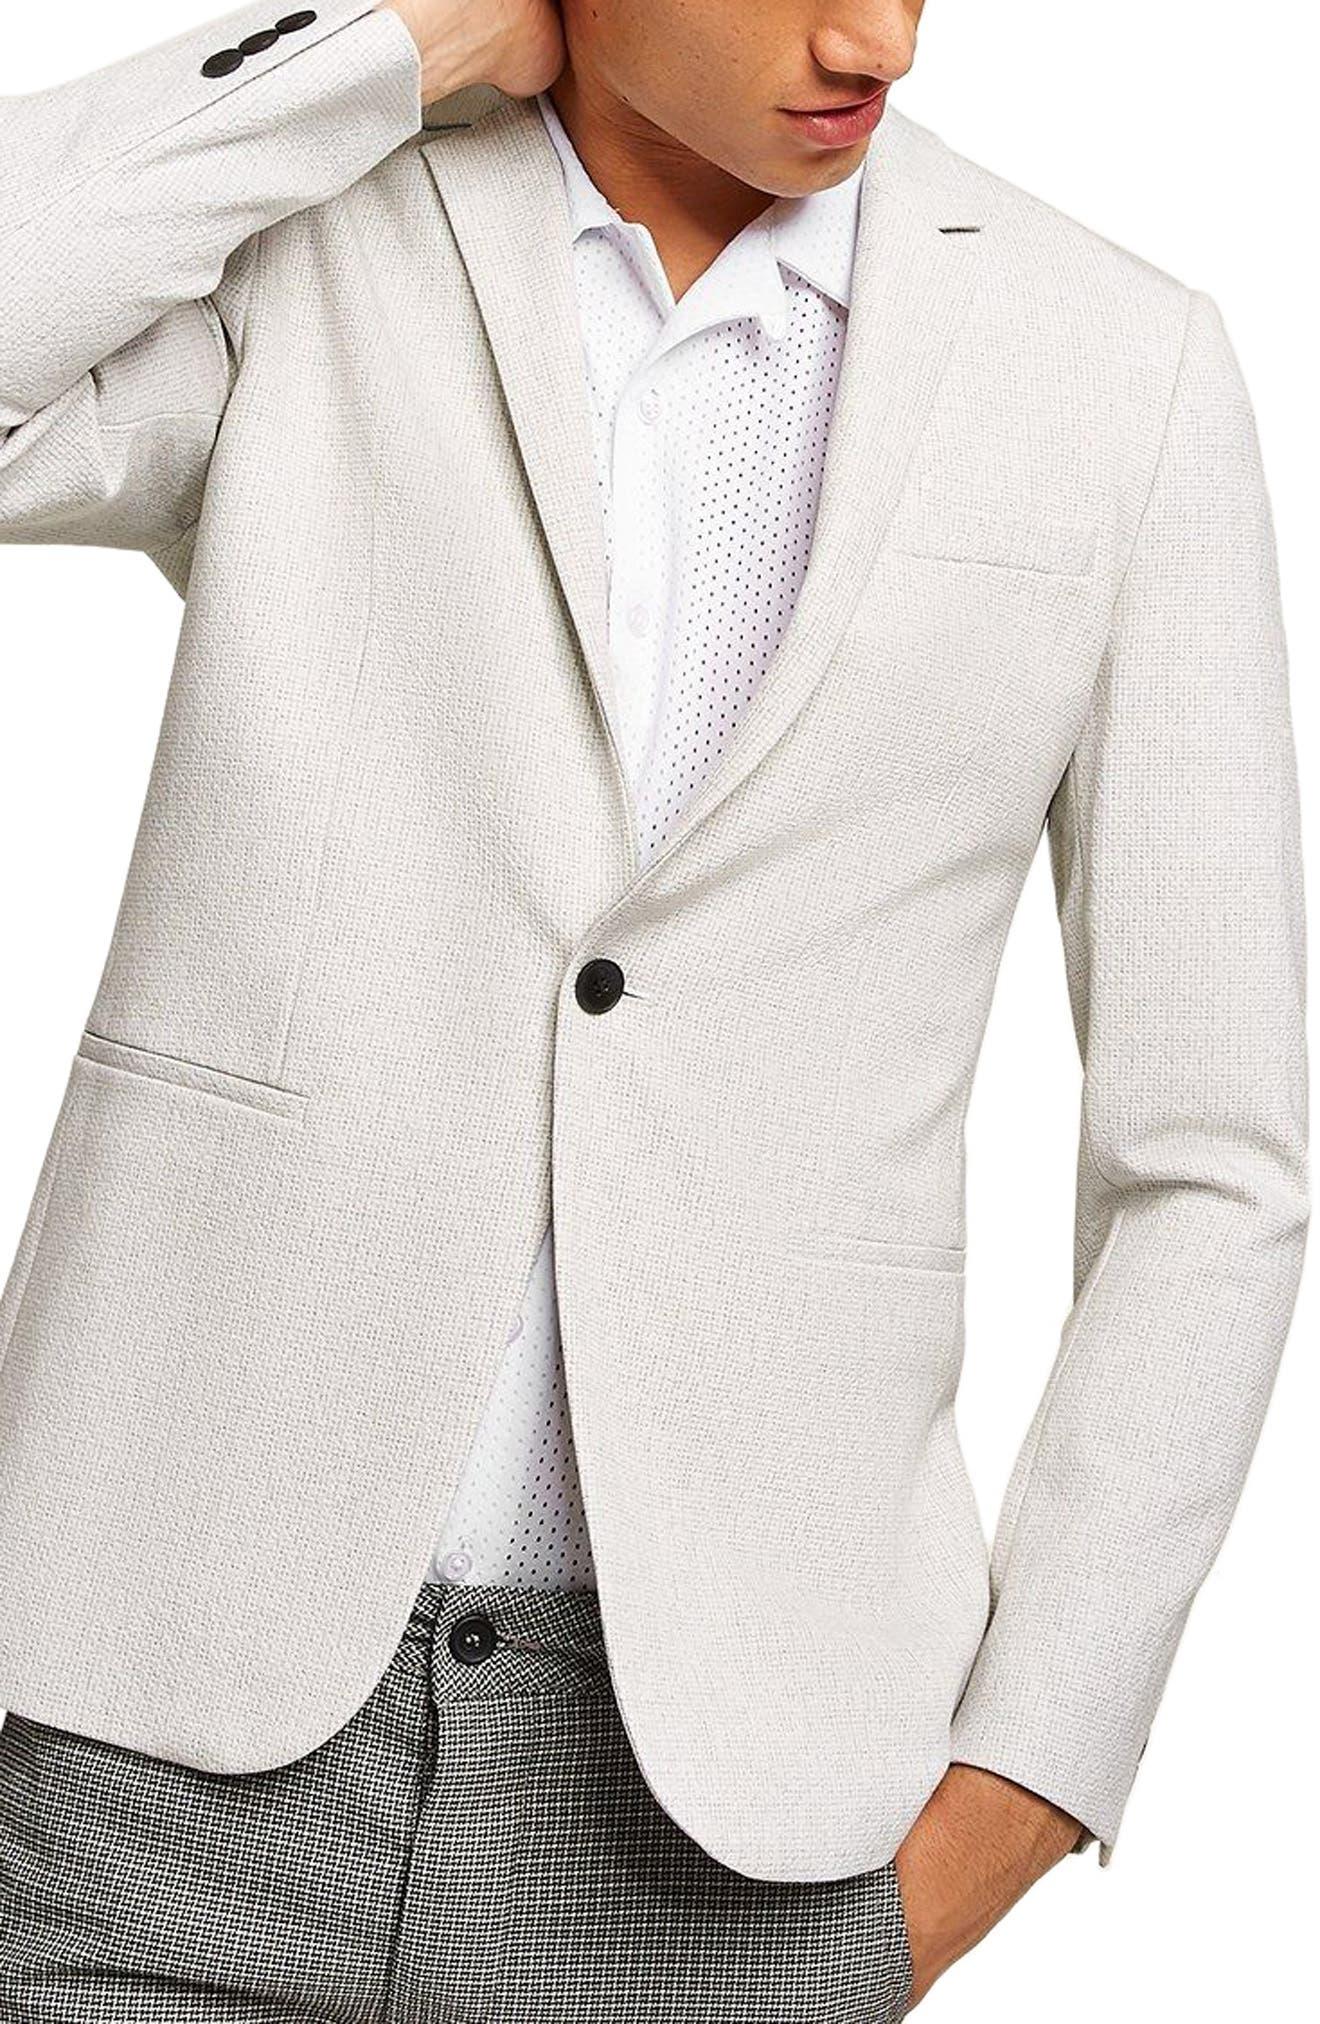 Lionis Skinny Fit Textured Sport Coat,                             Main thumbnail 1, color,                             LIGHT GREY